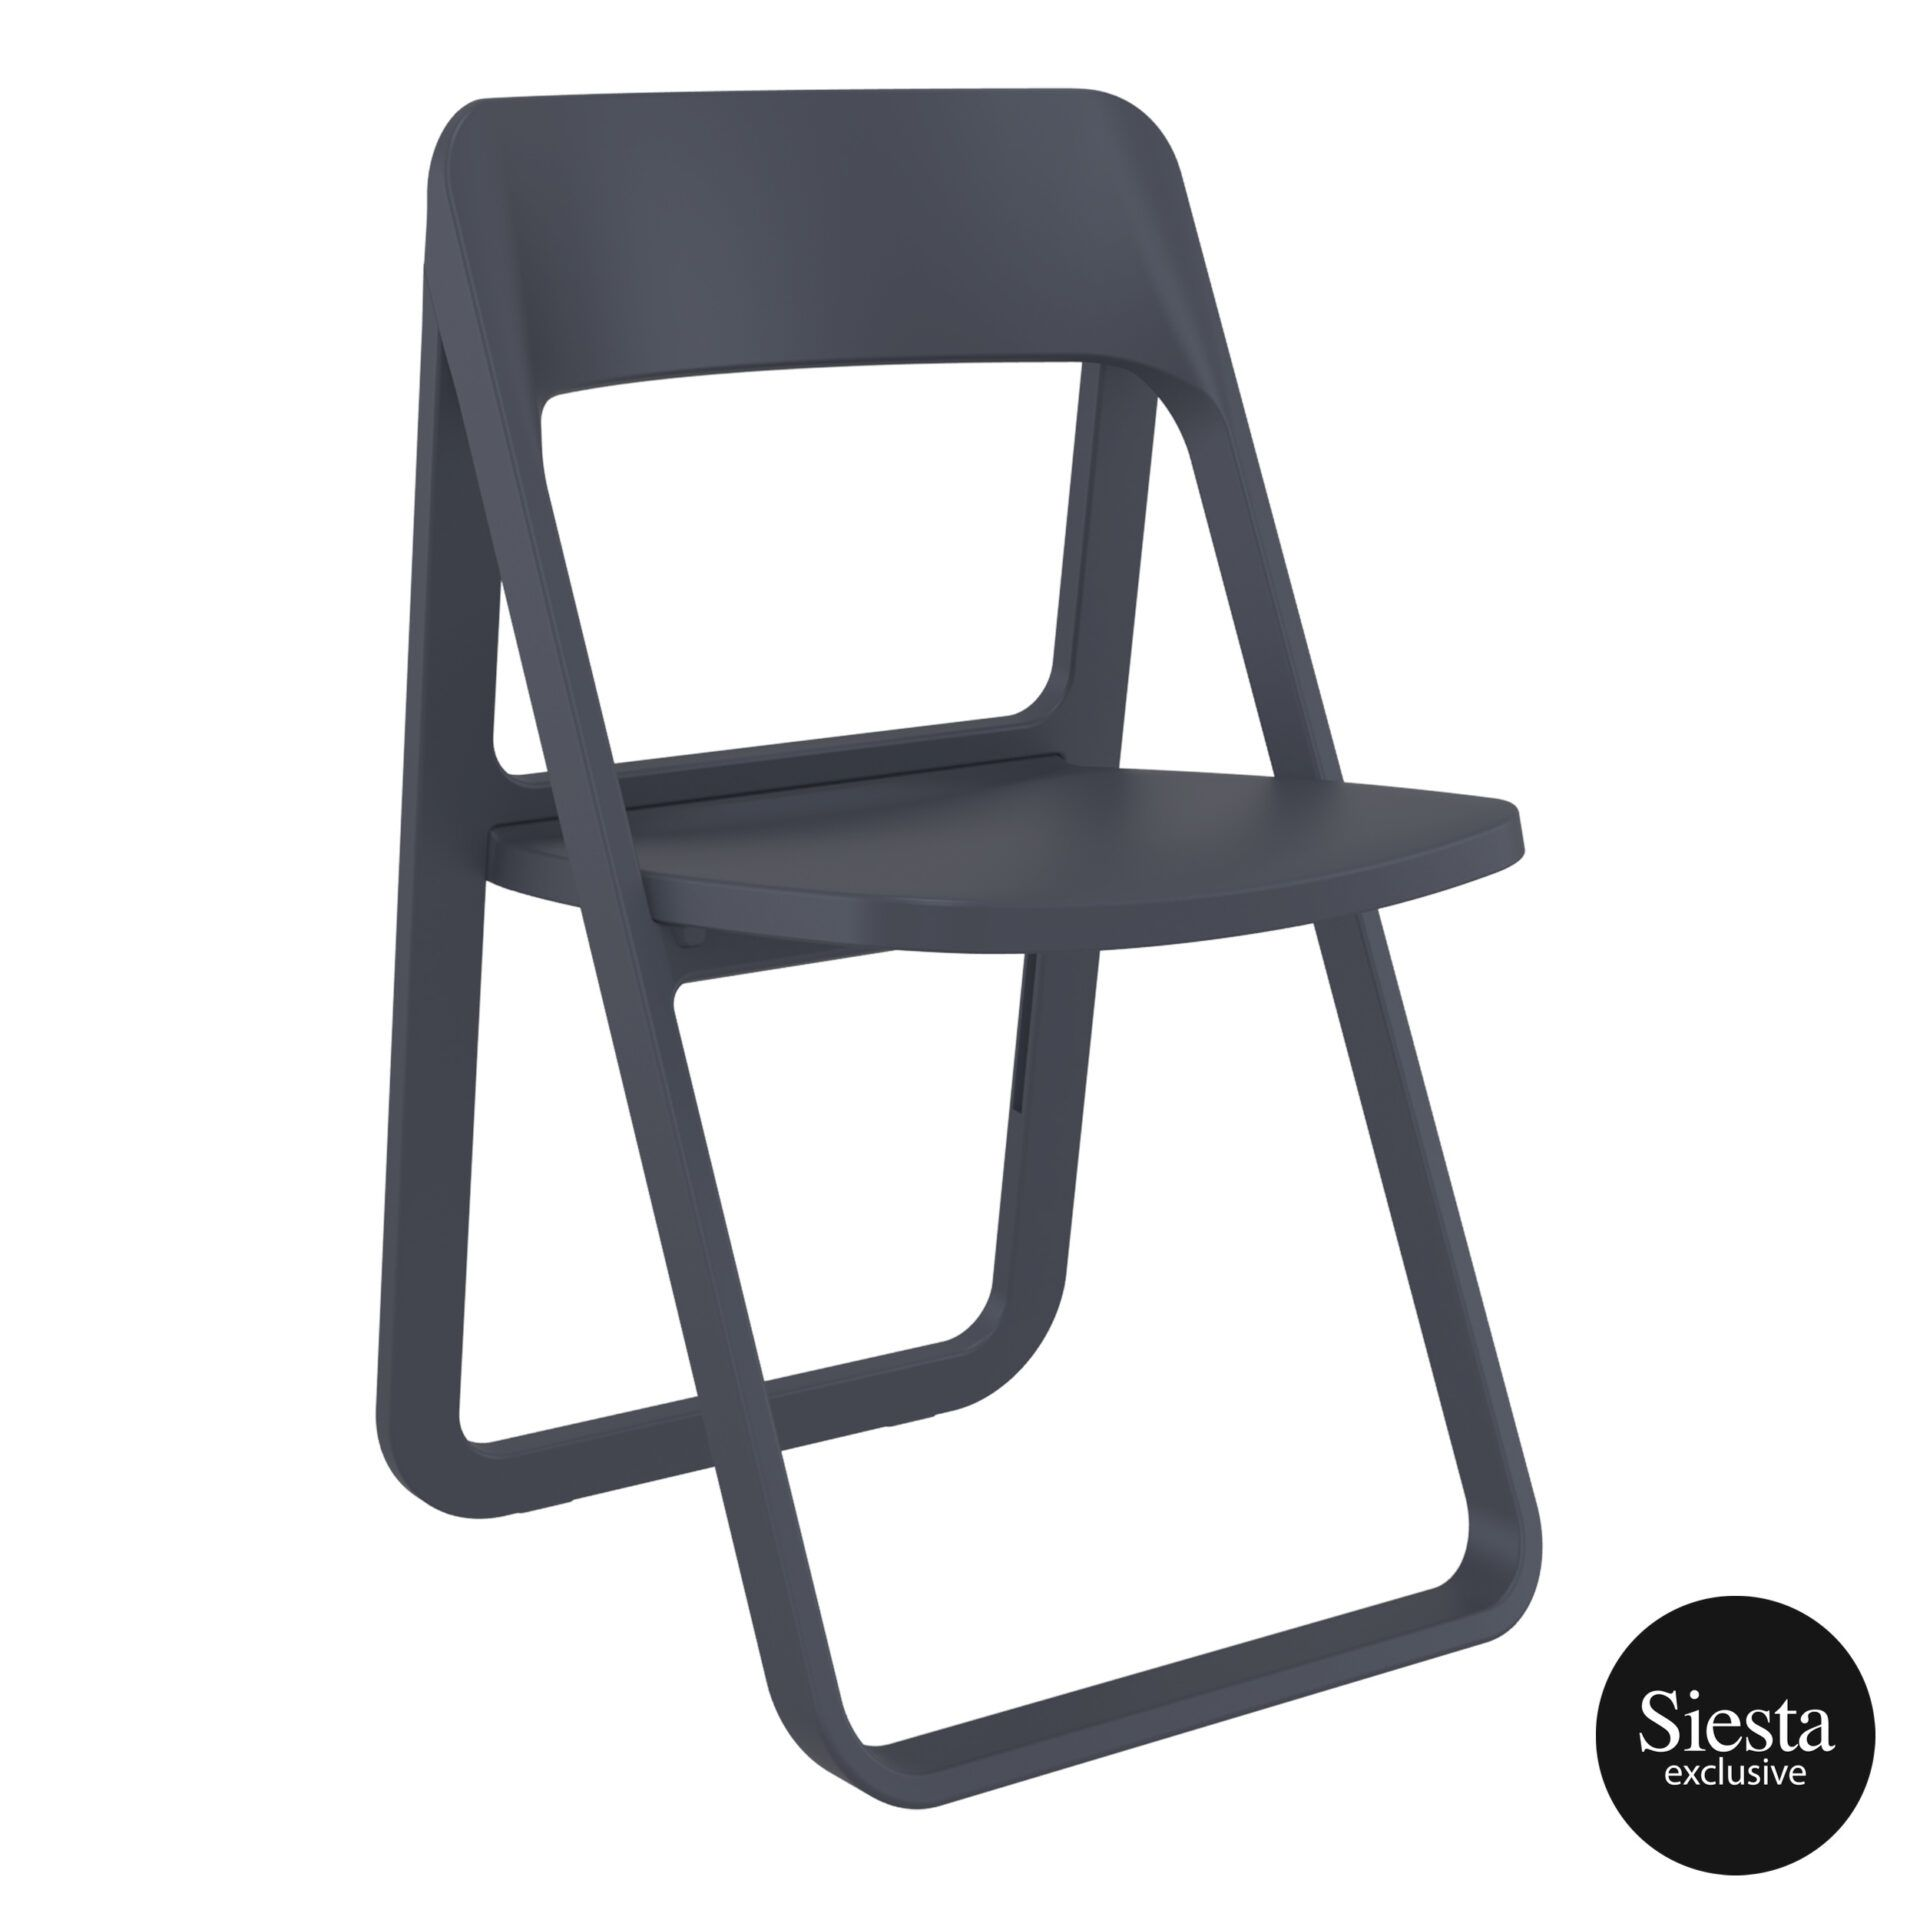 polypropylene dream folding chair darkgrey front side 2